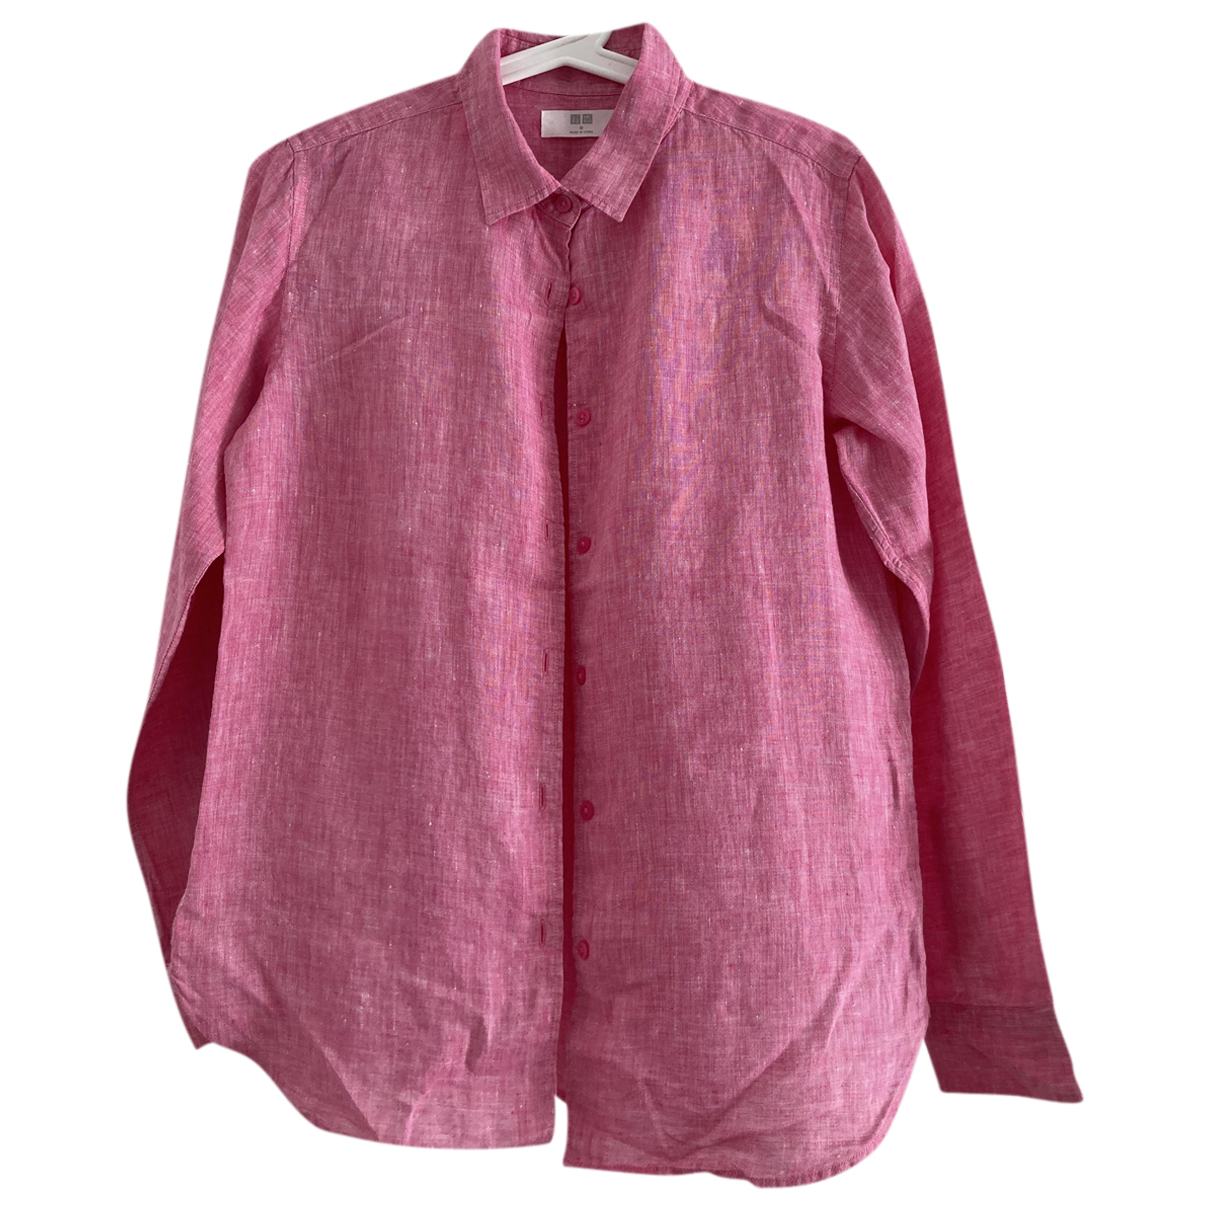 Uniqlo N Pink Linen  top for Women M International